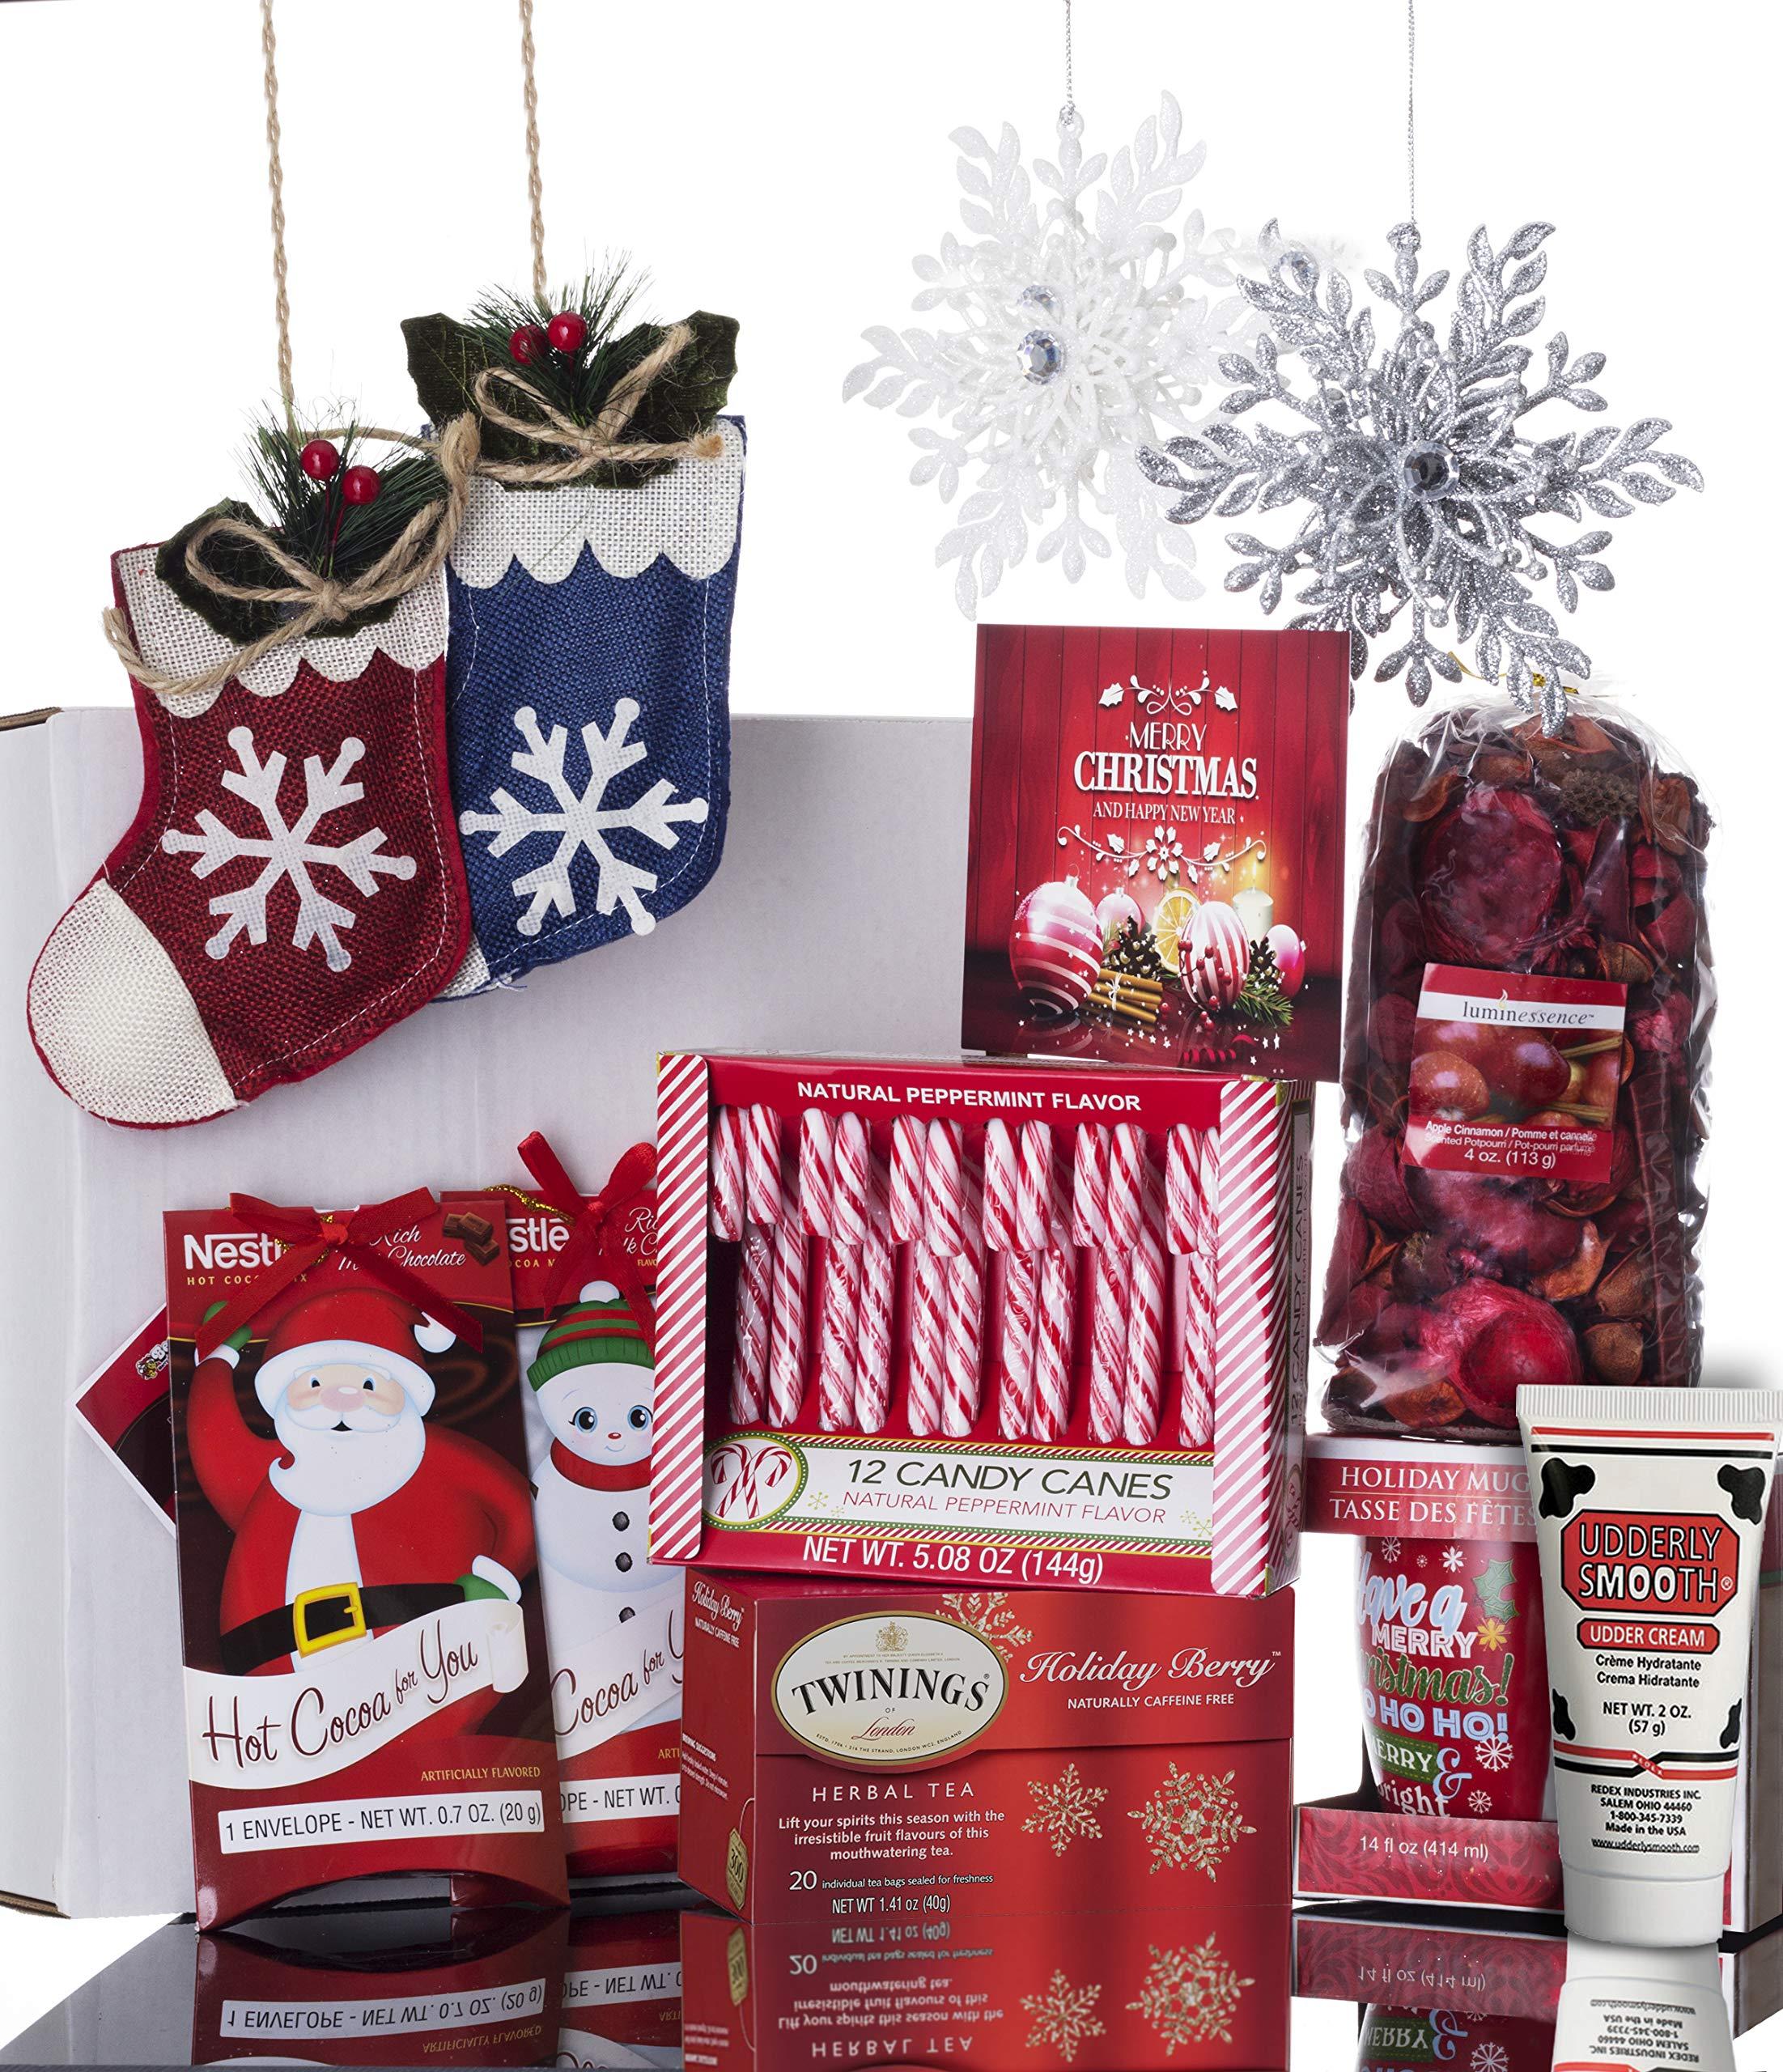 Christmas Gift Basket for Women: Ornaments, Tea, Candy Cane, Mug, Hot Chocolate, Hand Cream, Potpourri Set for Her